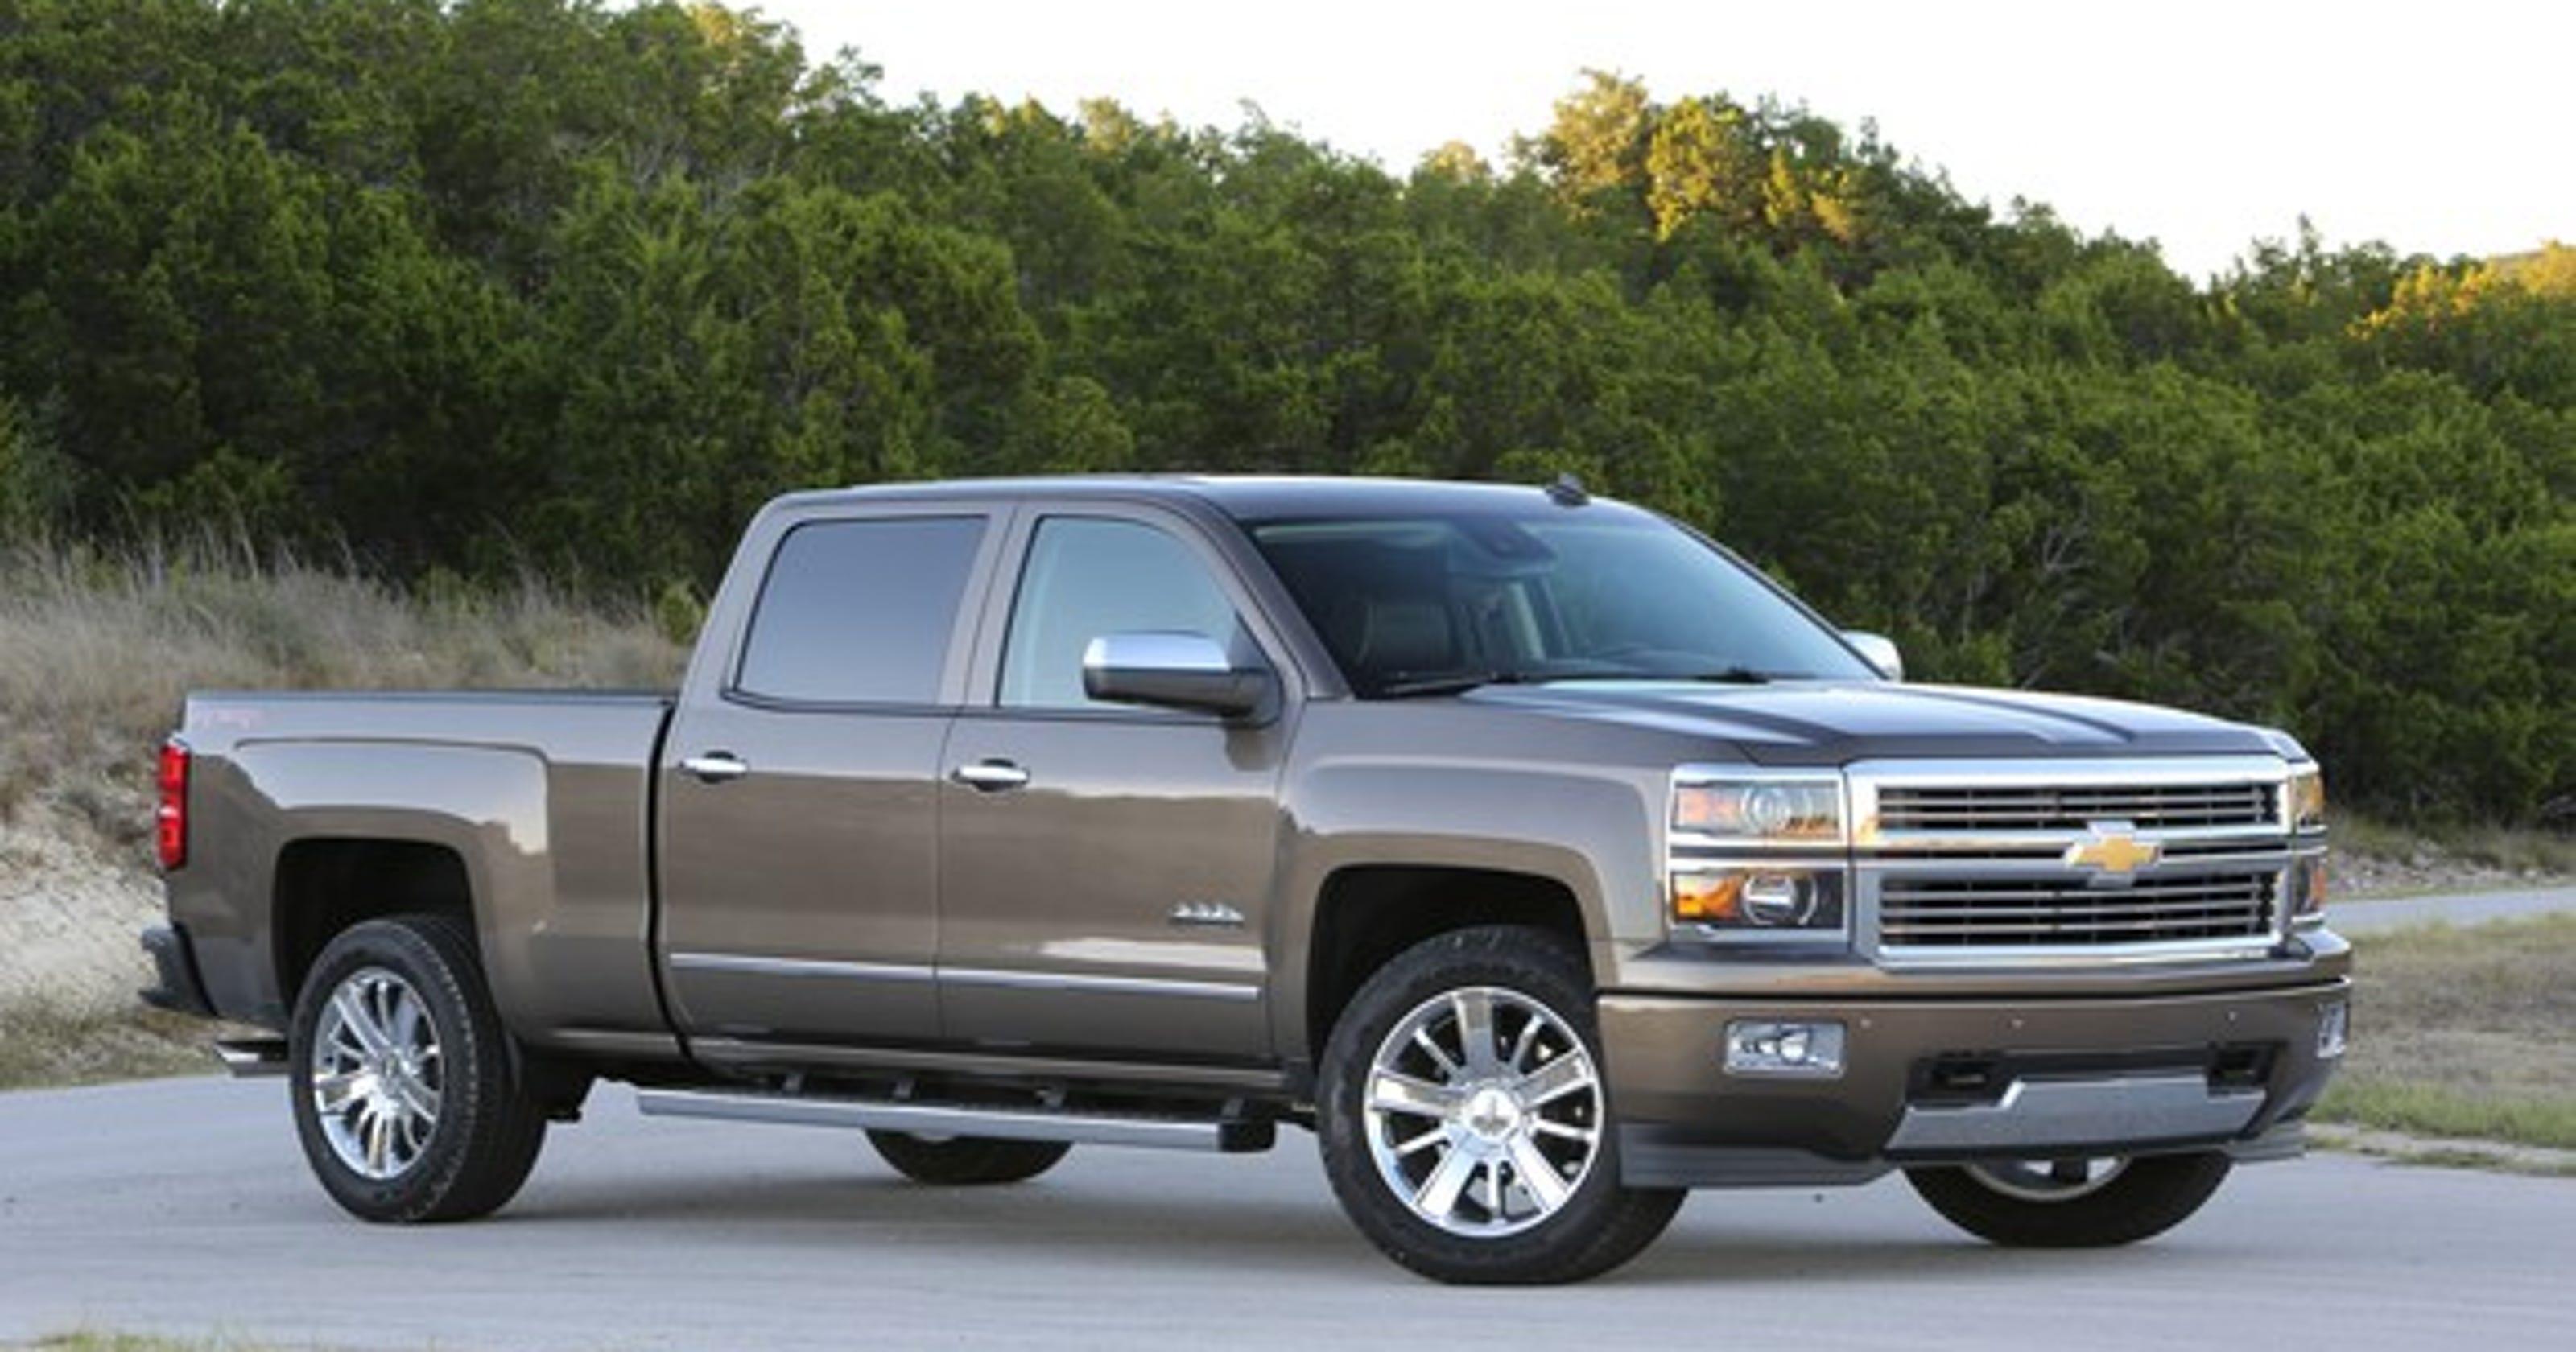 Gm Recalls Chevy Silverado Sierra Trucks To Fix Potential Fuel Leaks Dodge Diesel Filter Location For 2014